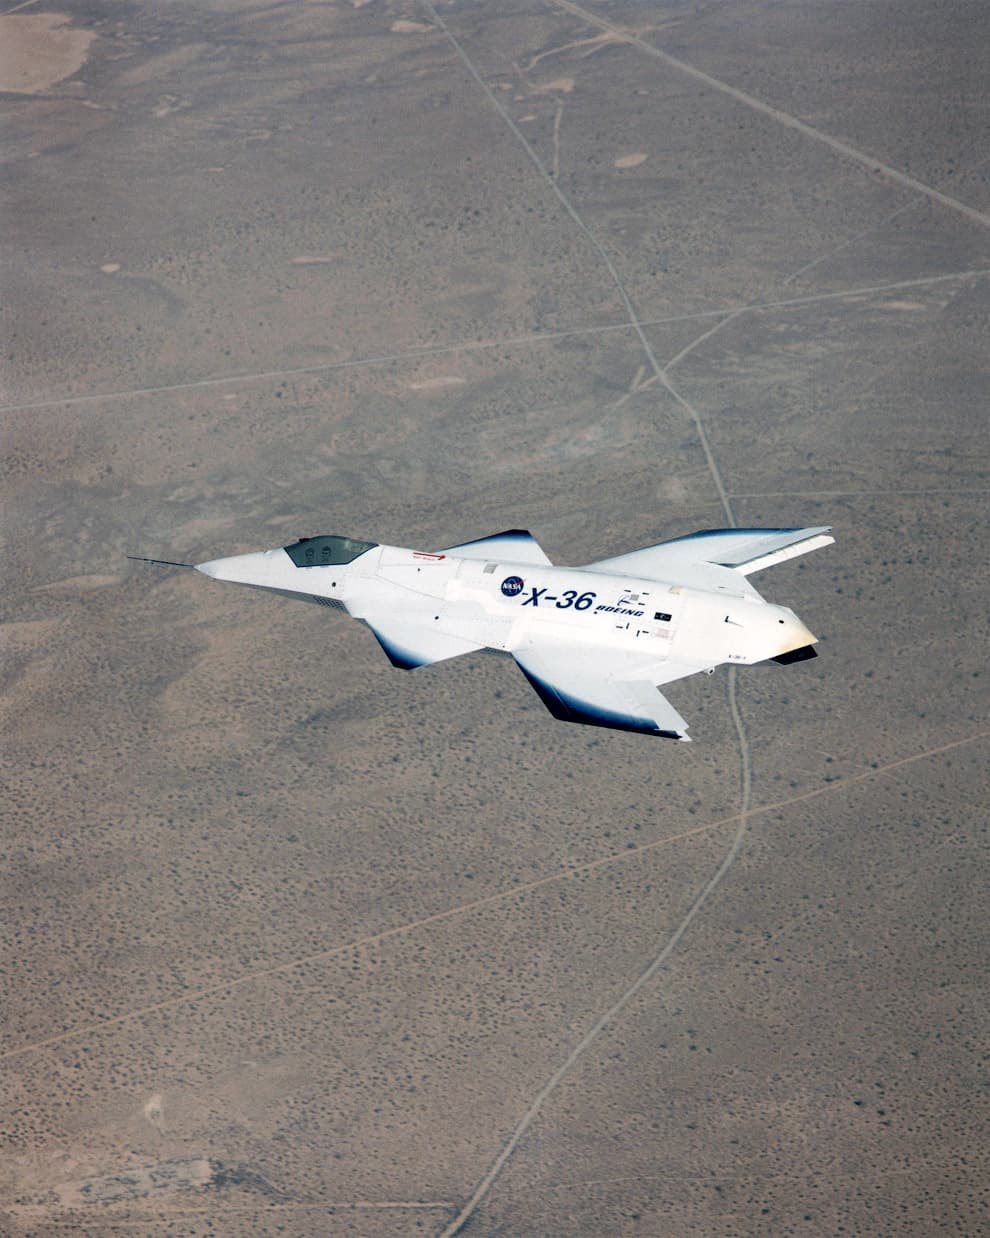 McDonell Douglas X-36